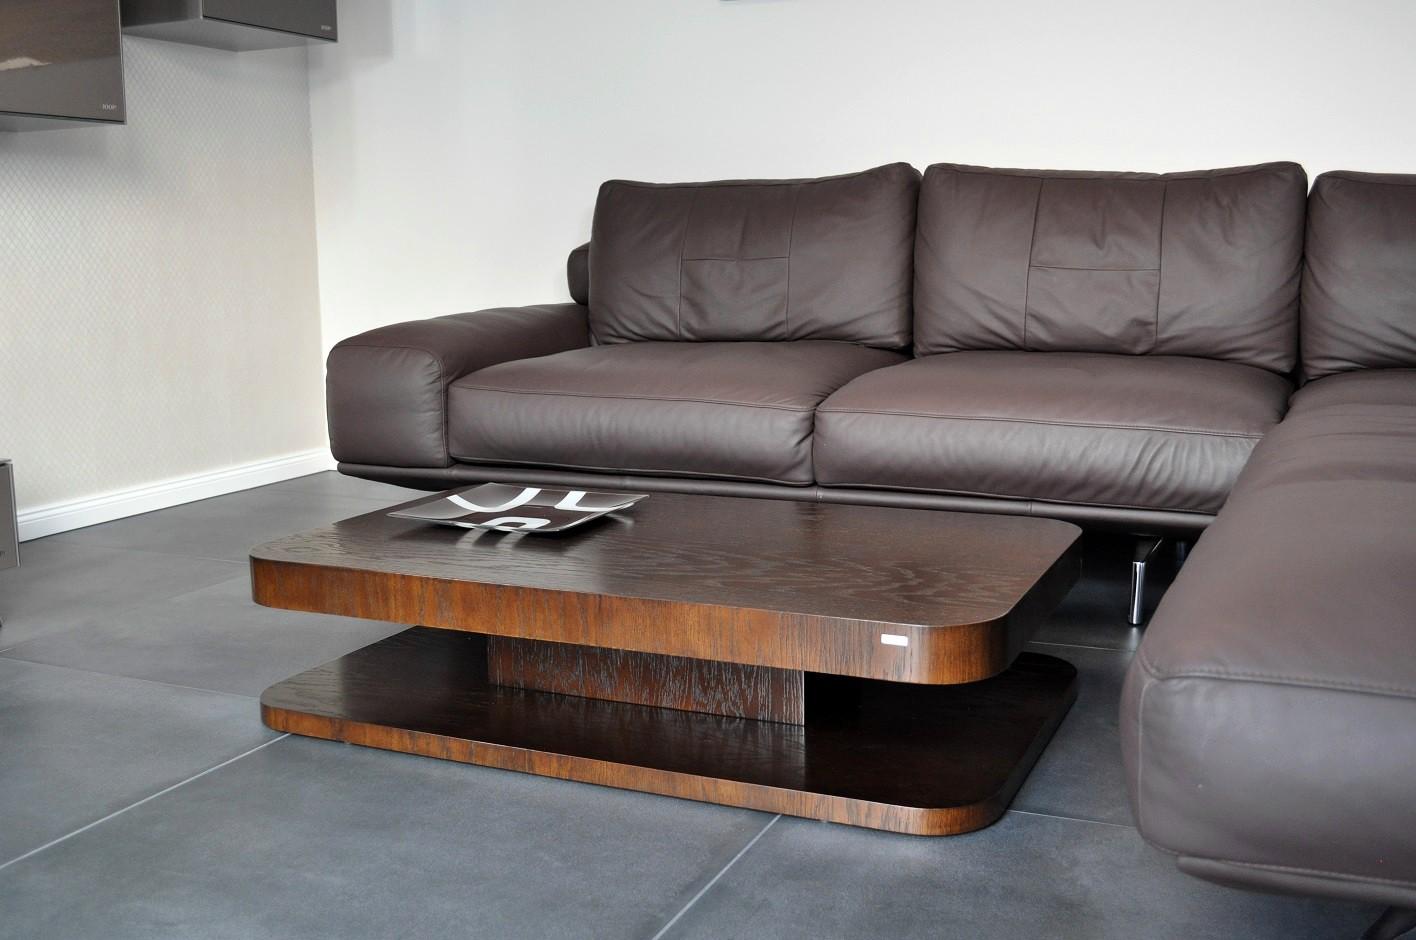 design couchtisch carl svensson mv 1 walnuss wenge ecken abgerundet couchtische walnuss wenge. Black Bedroom Furniture Sets. Home Design Ideas